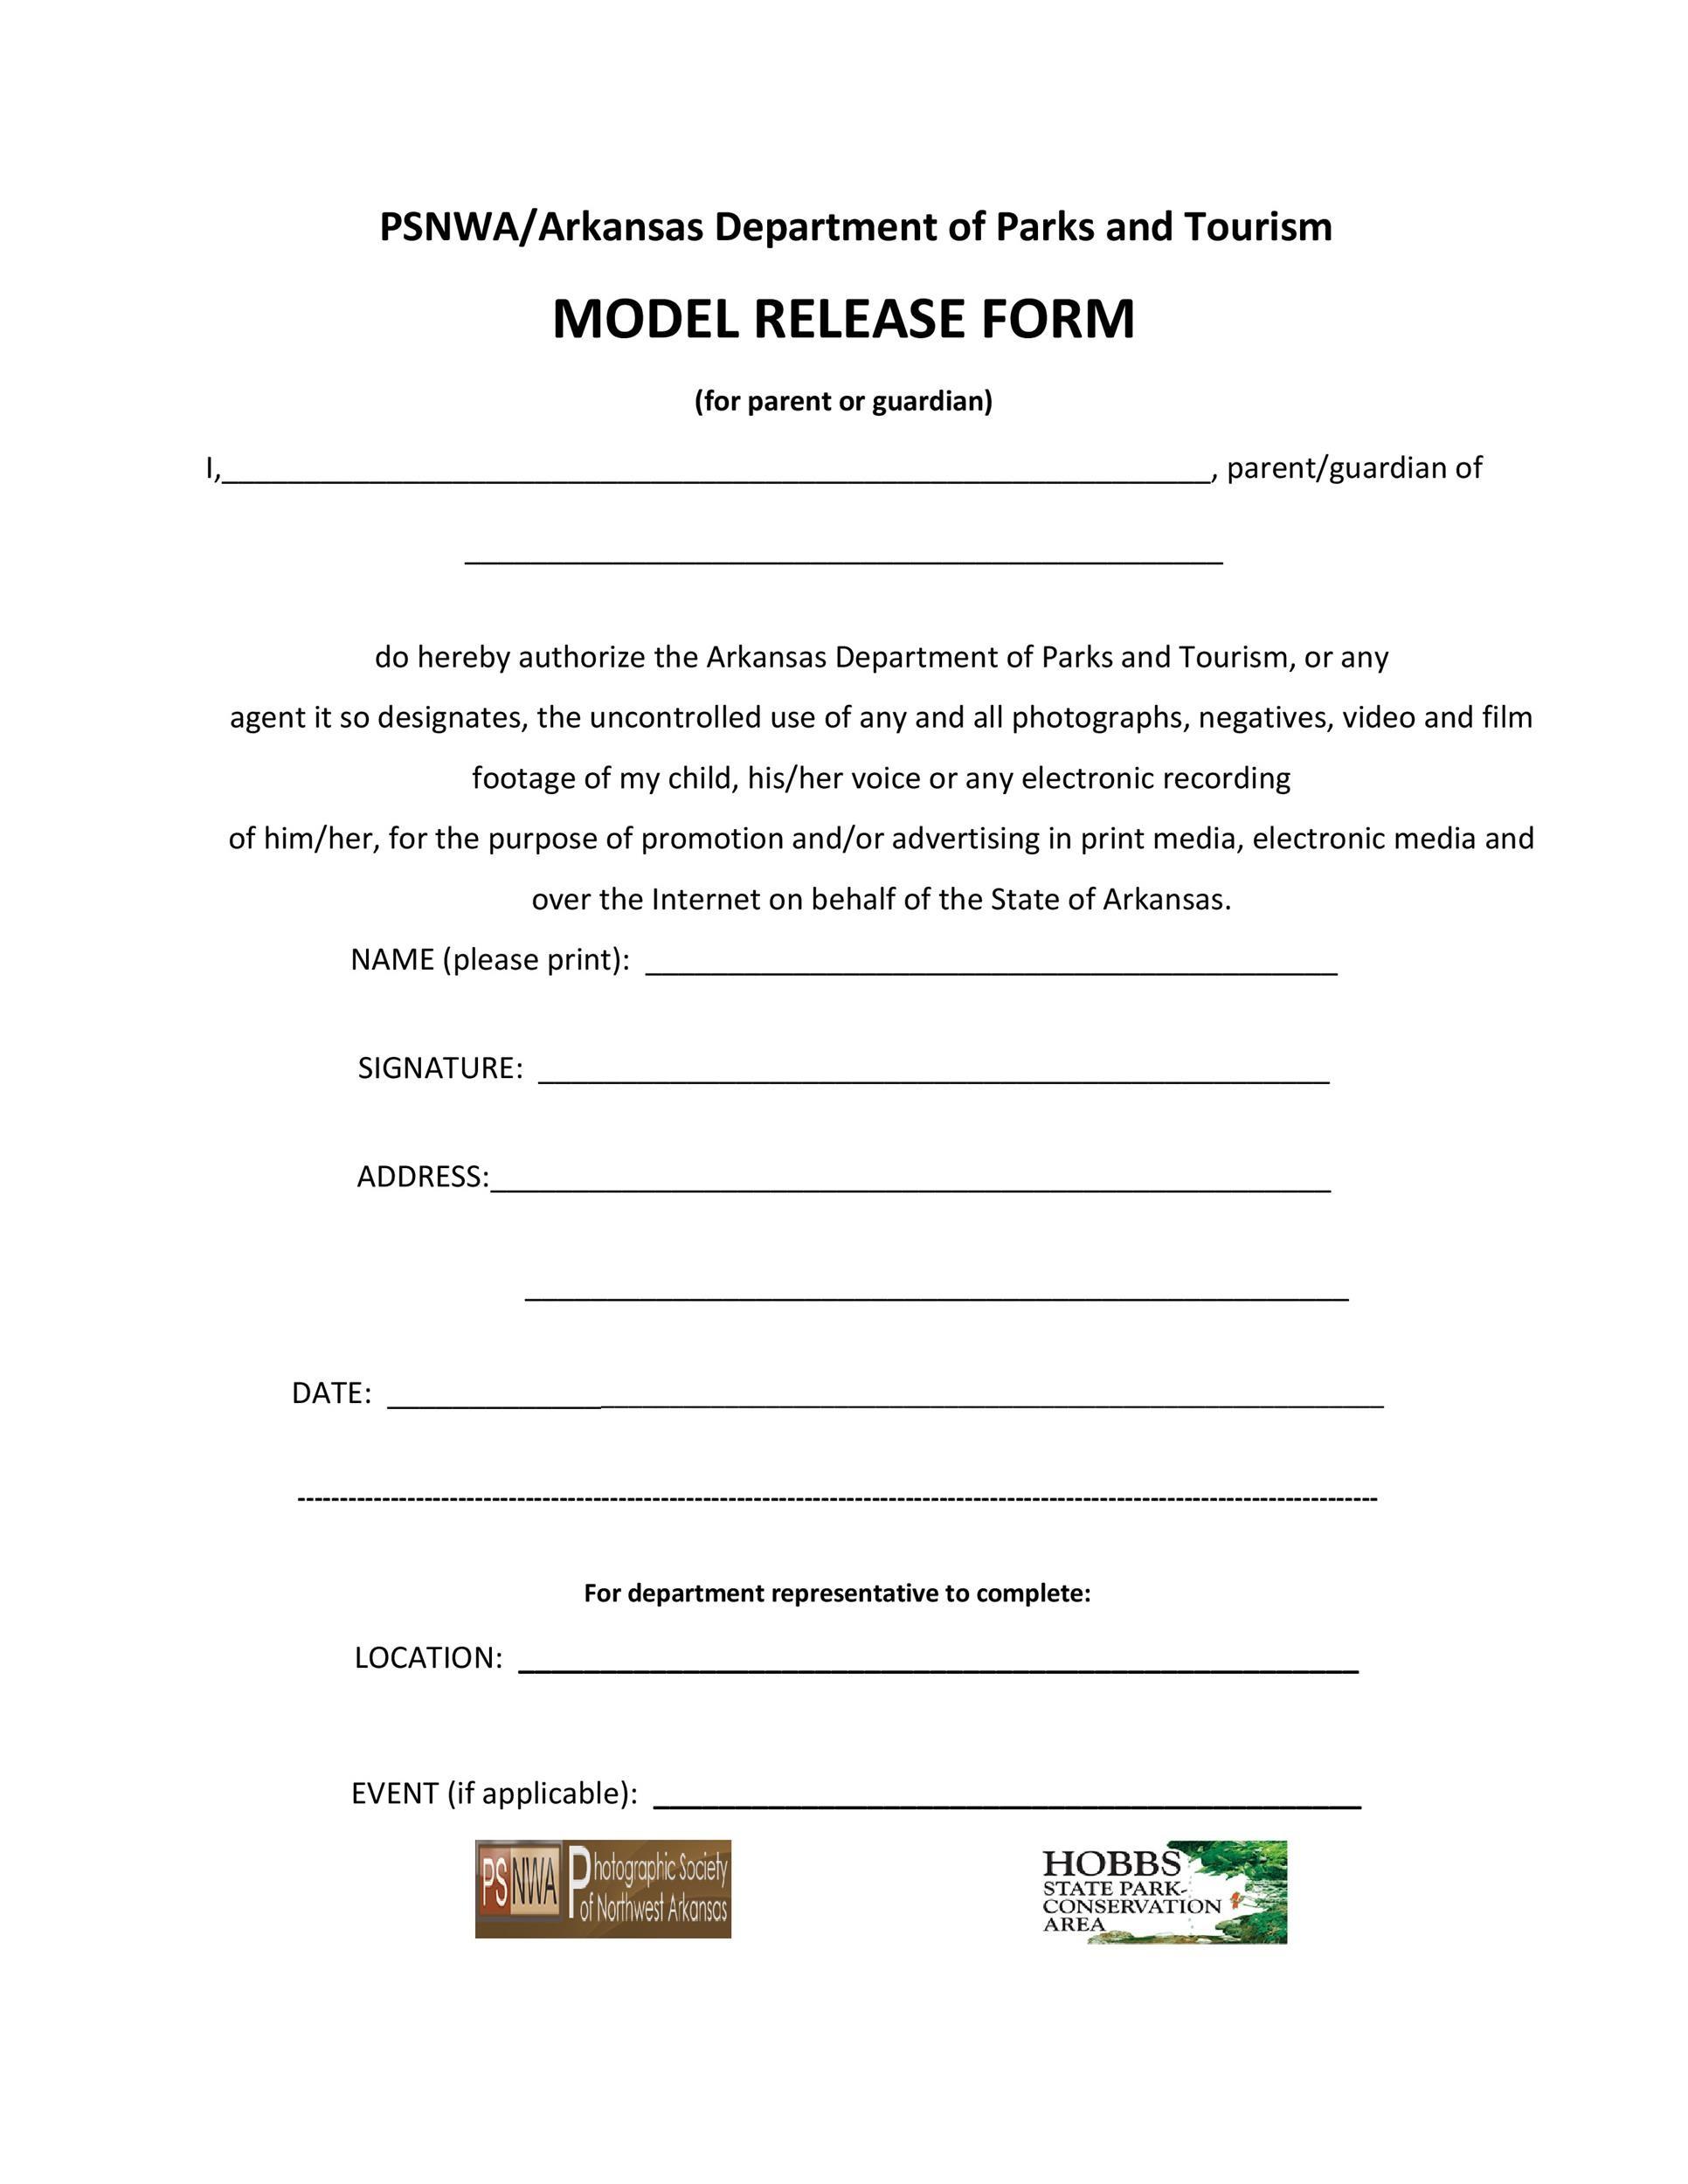 Free model release form 41